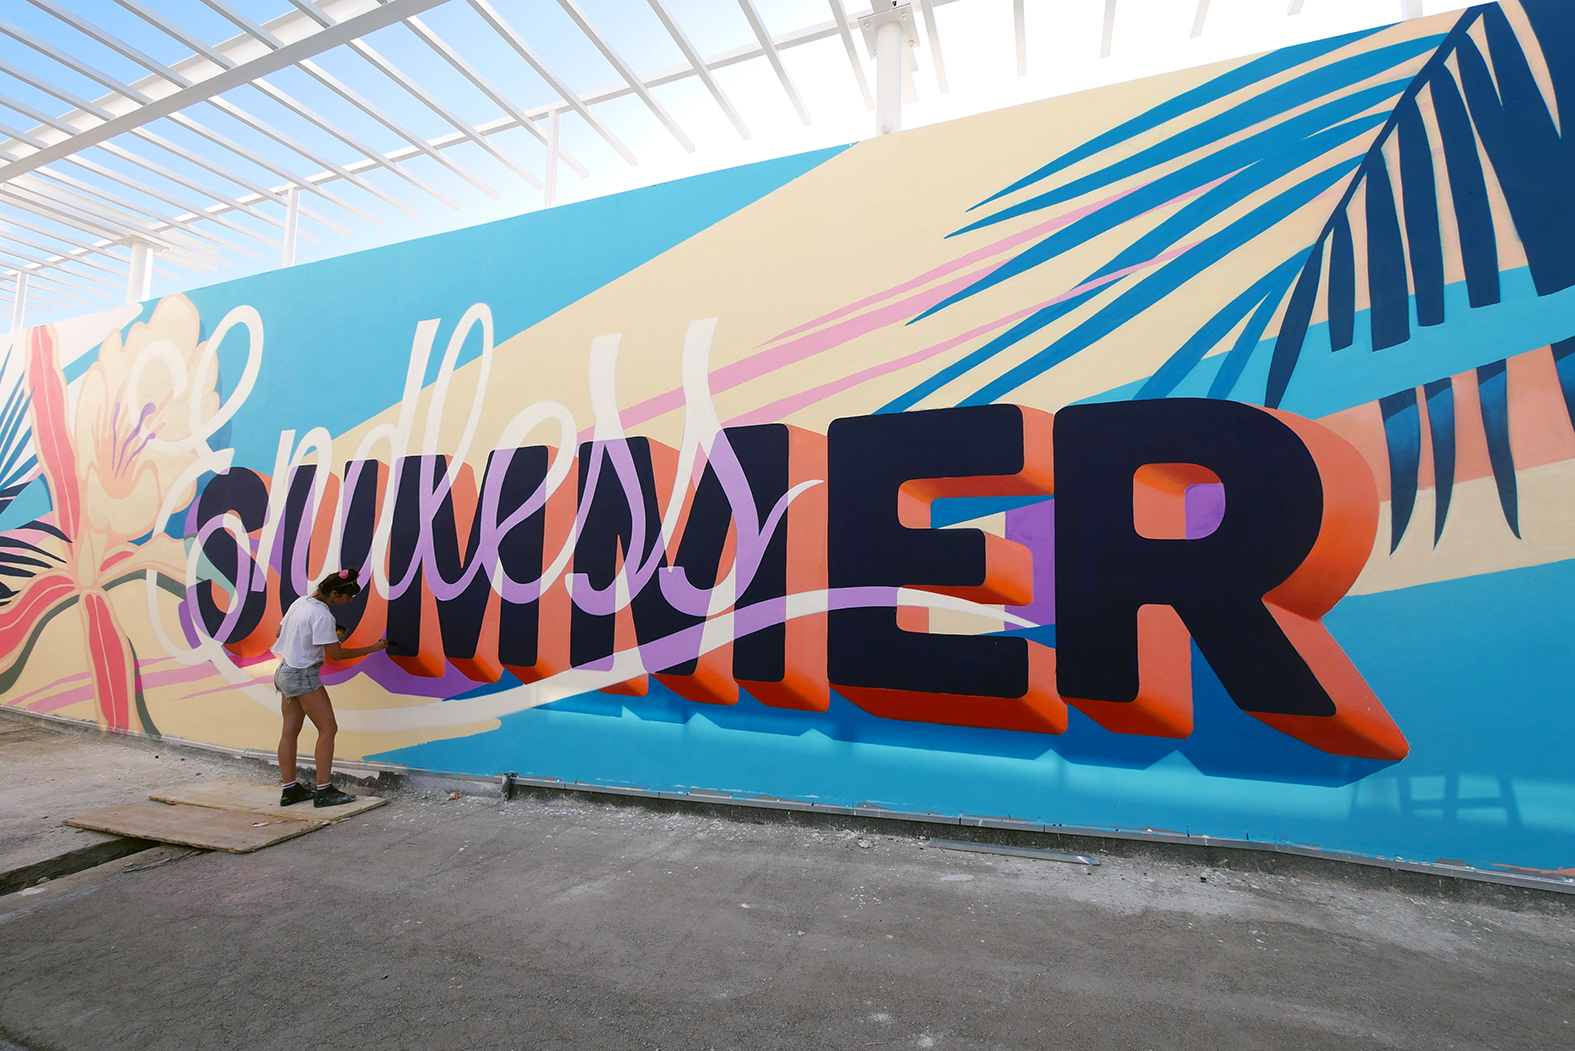 Nerone-W-hotel-painting-street-art-ibiza-19